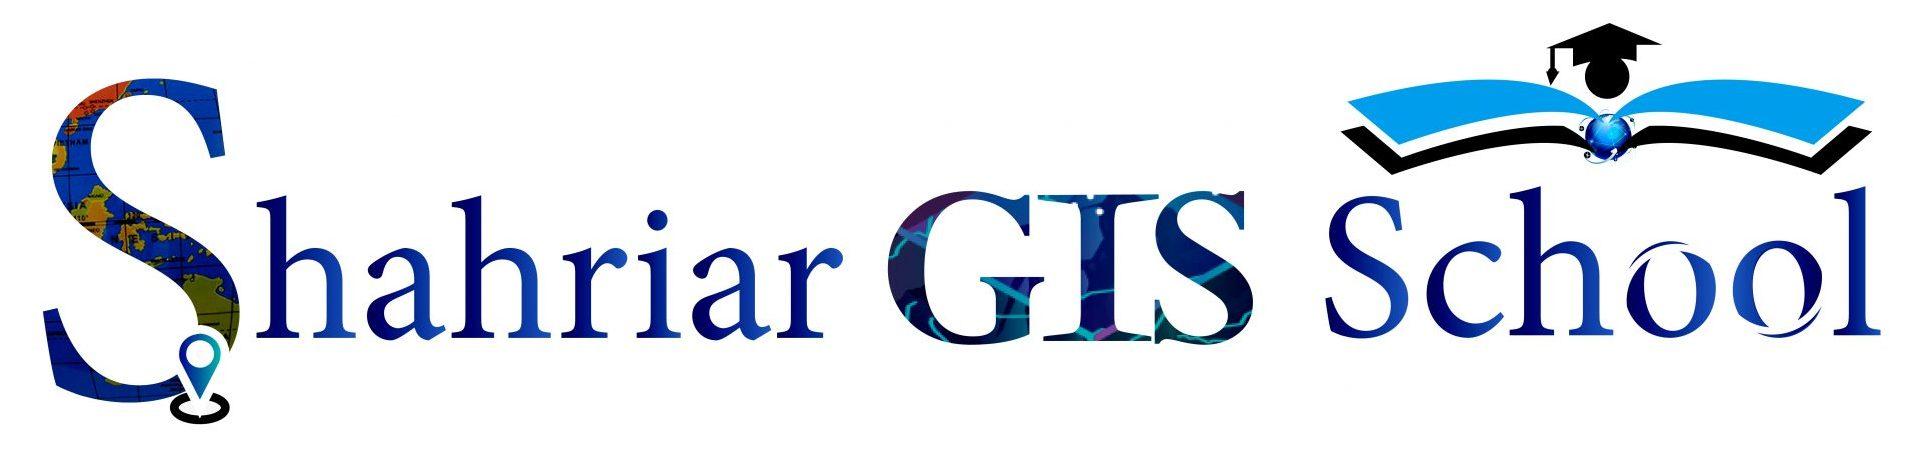 Shahriar GIS School